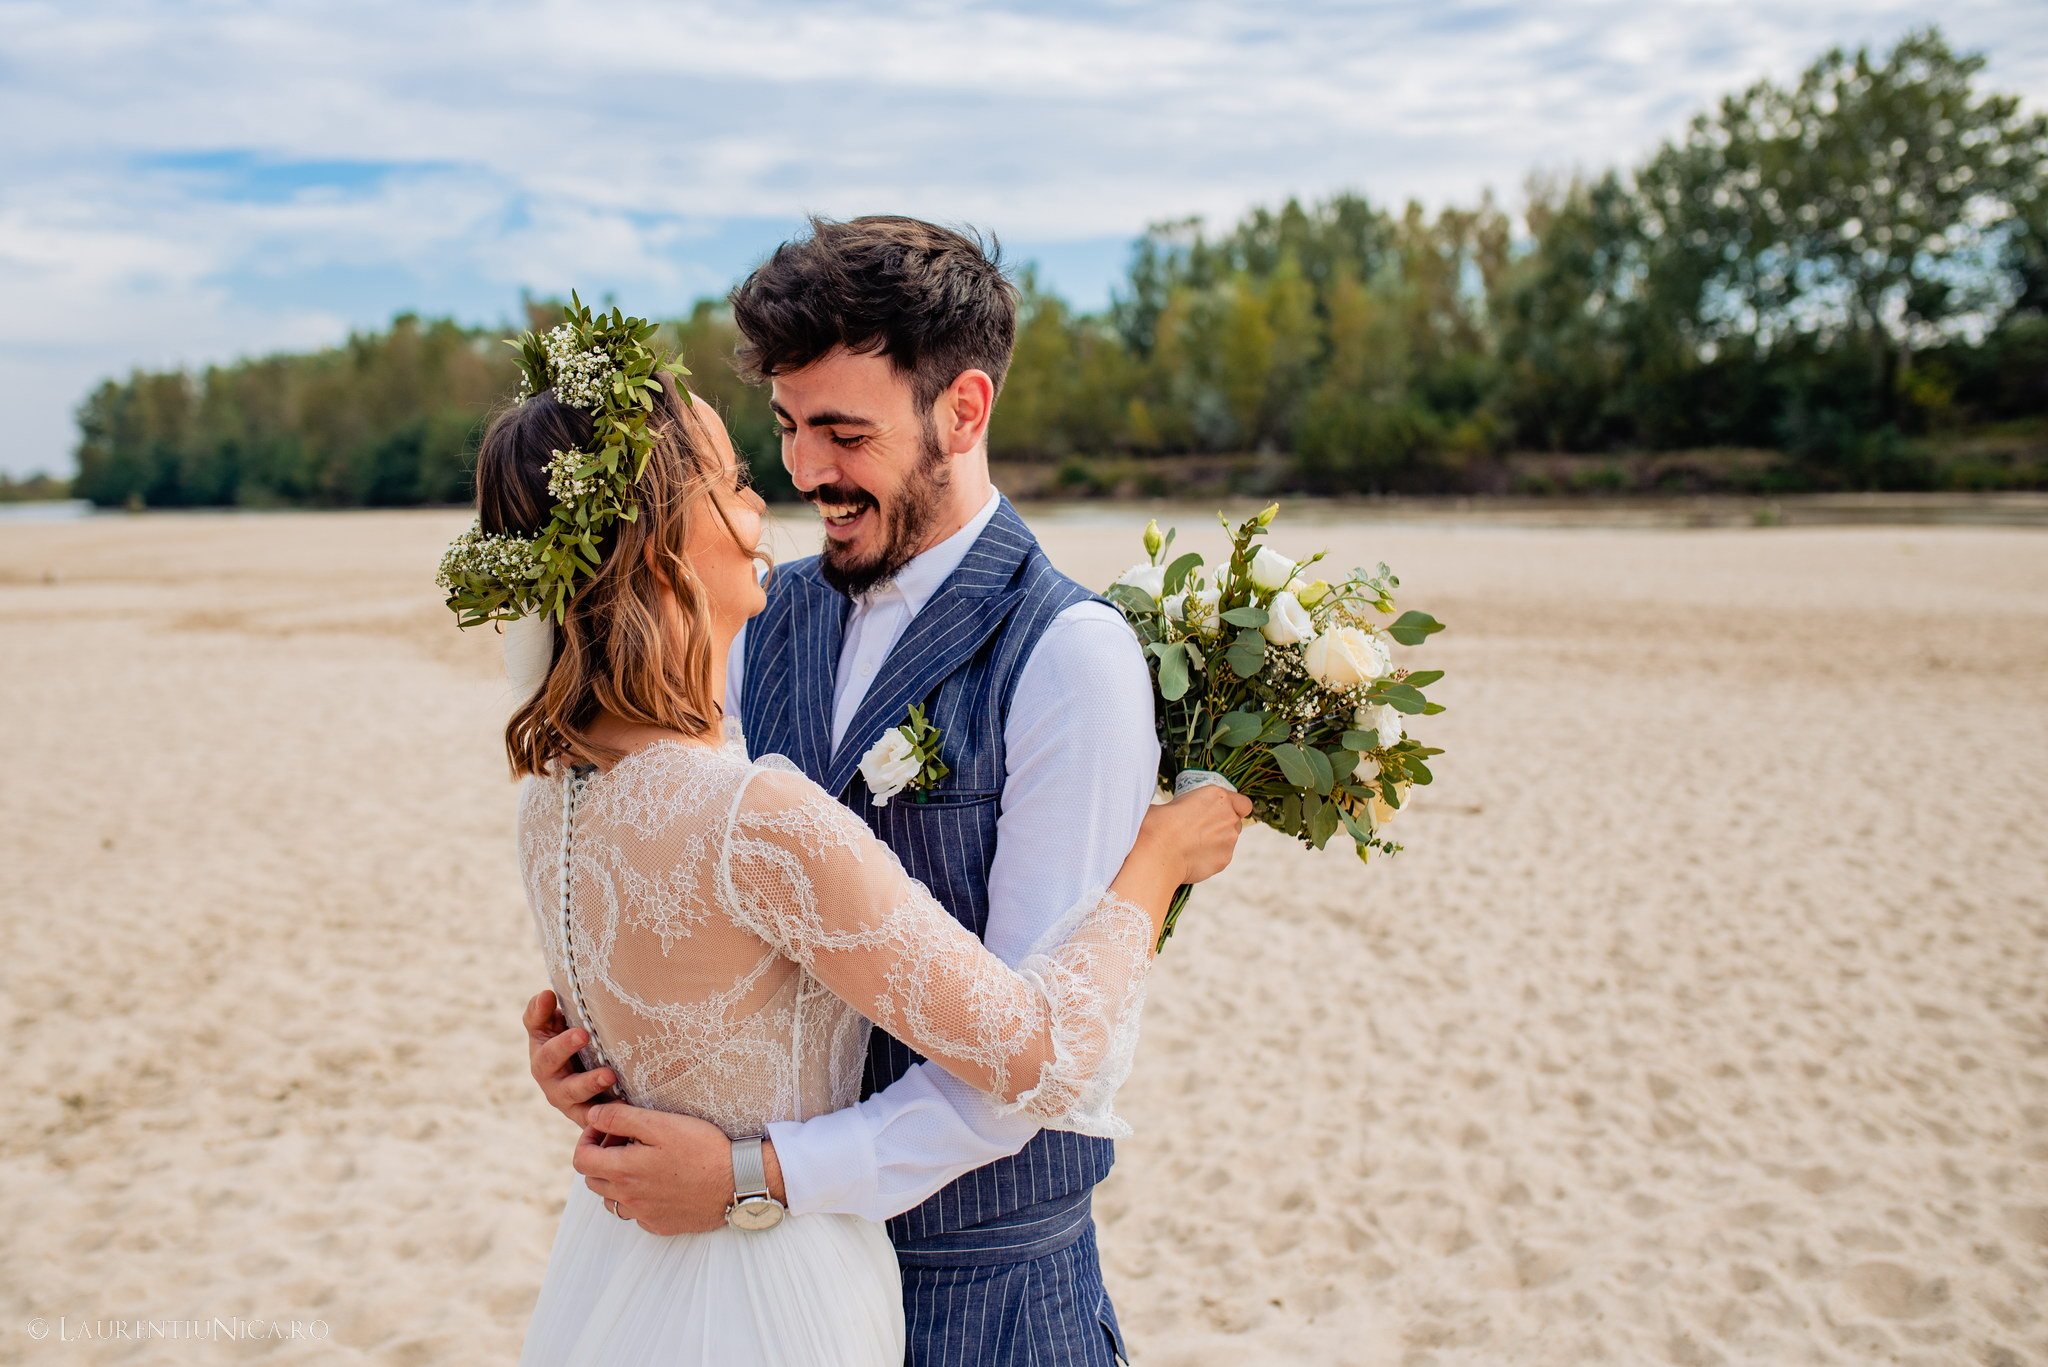 20180915 LN 0517 - Diana & Marius | Fotografii nunta | Slatina